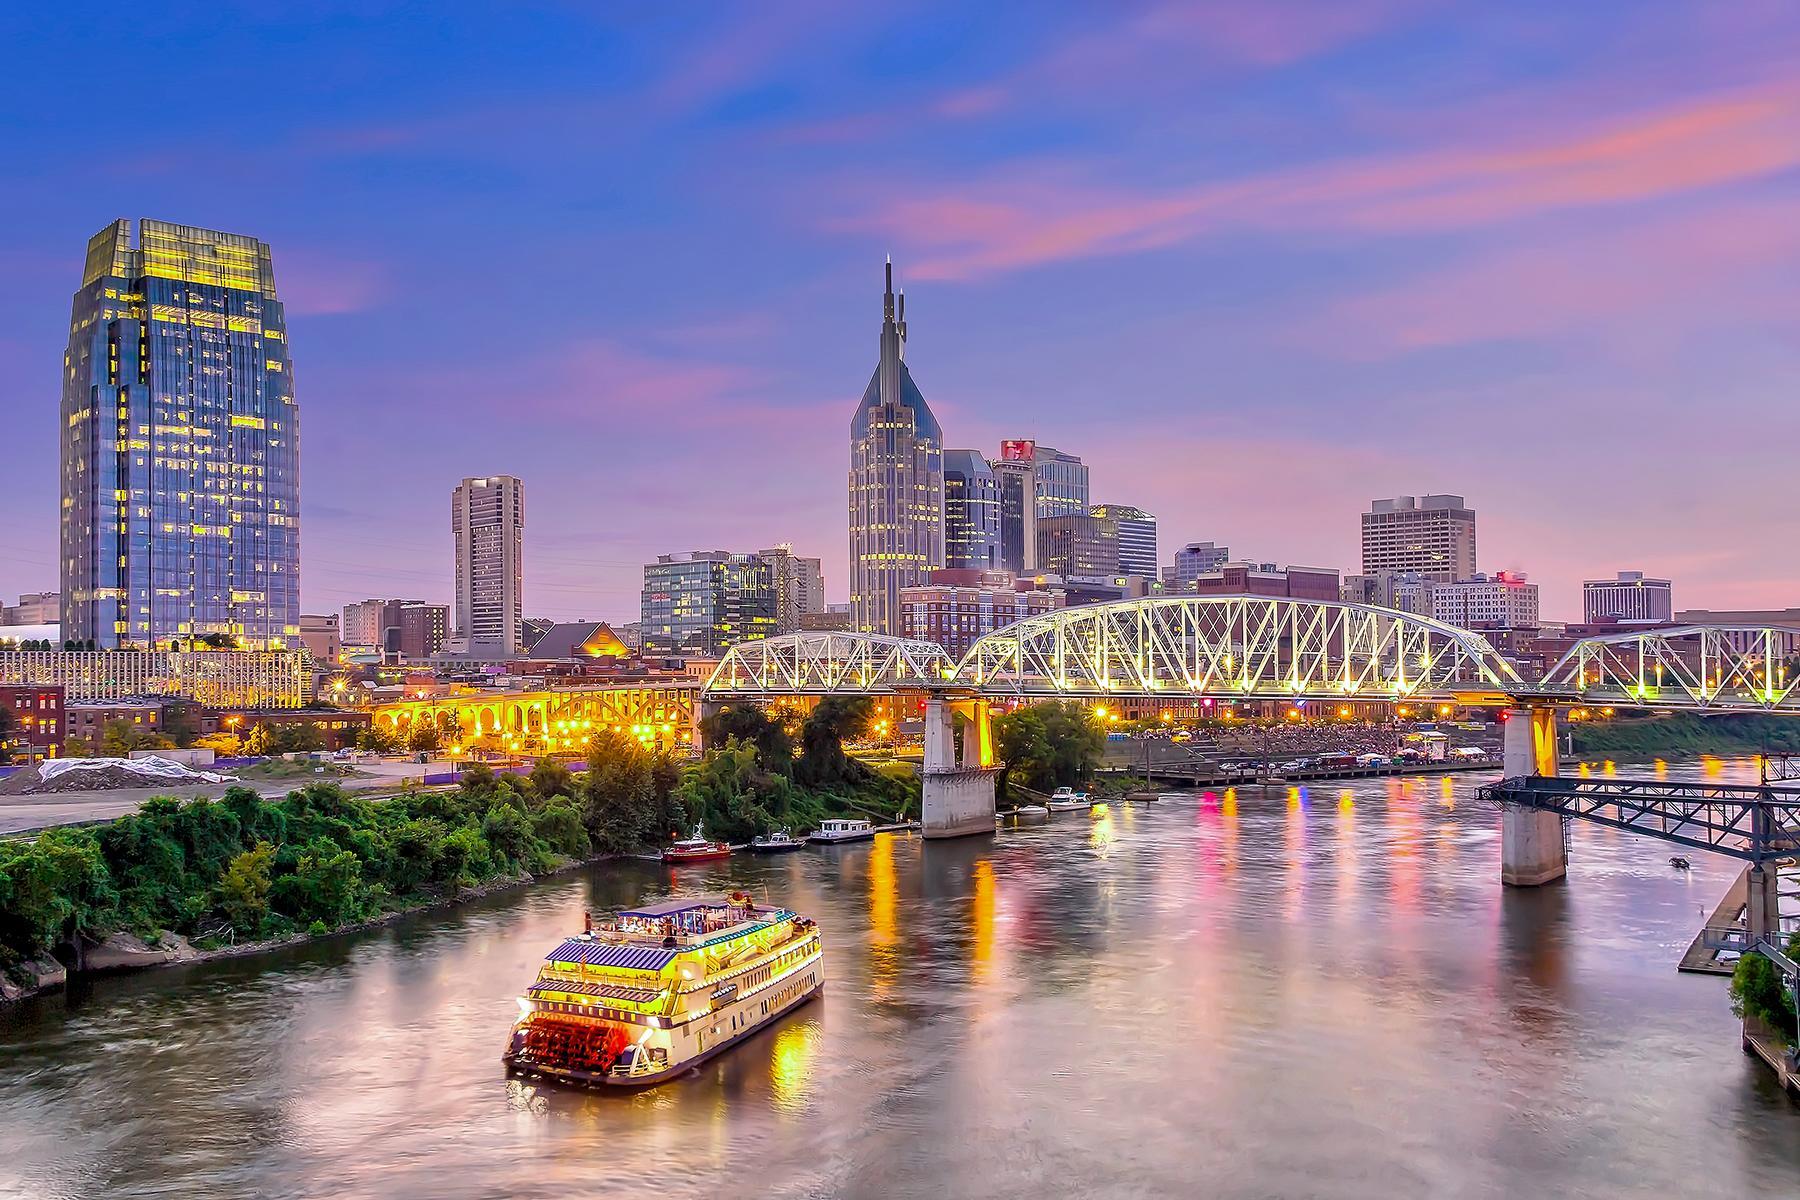 01_NashvillePhrases__River_iStock-1130838130